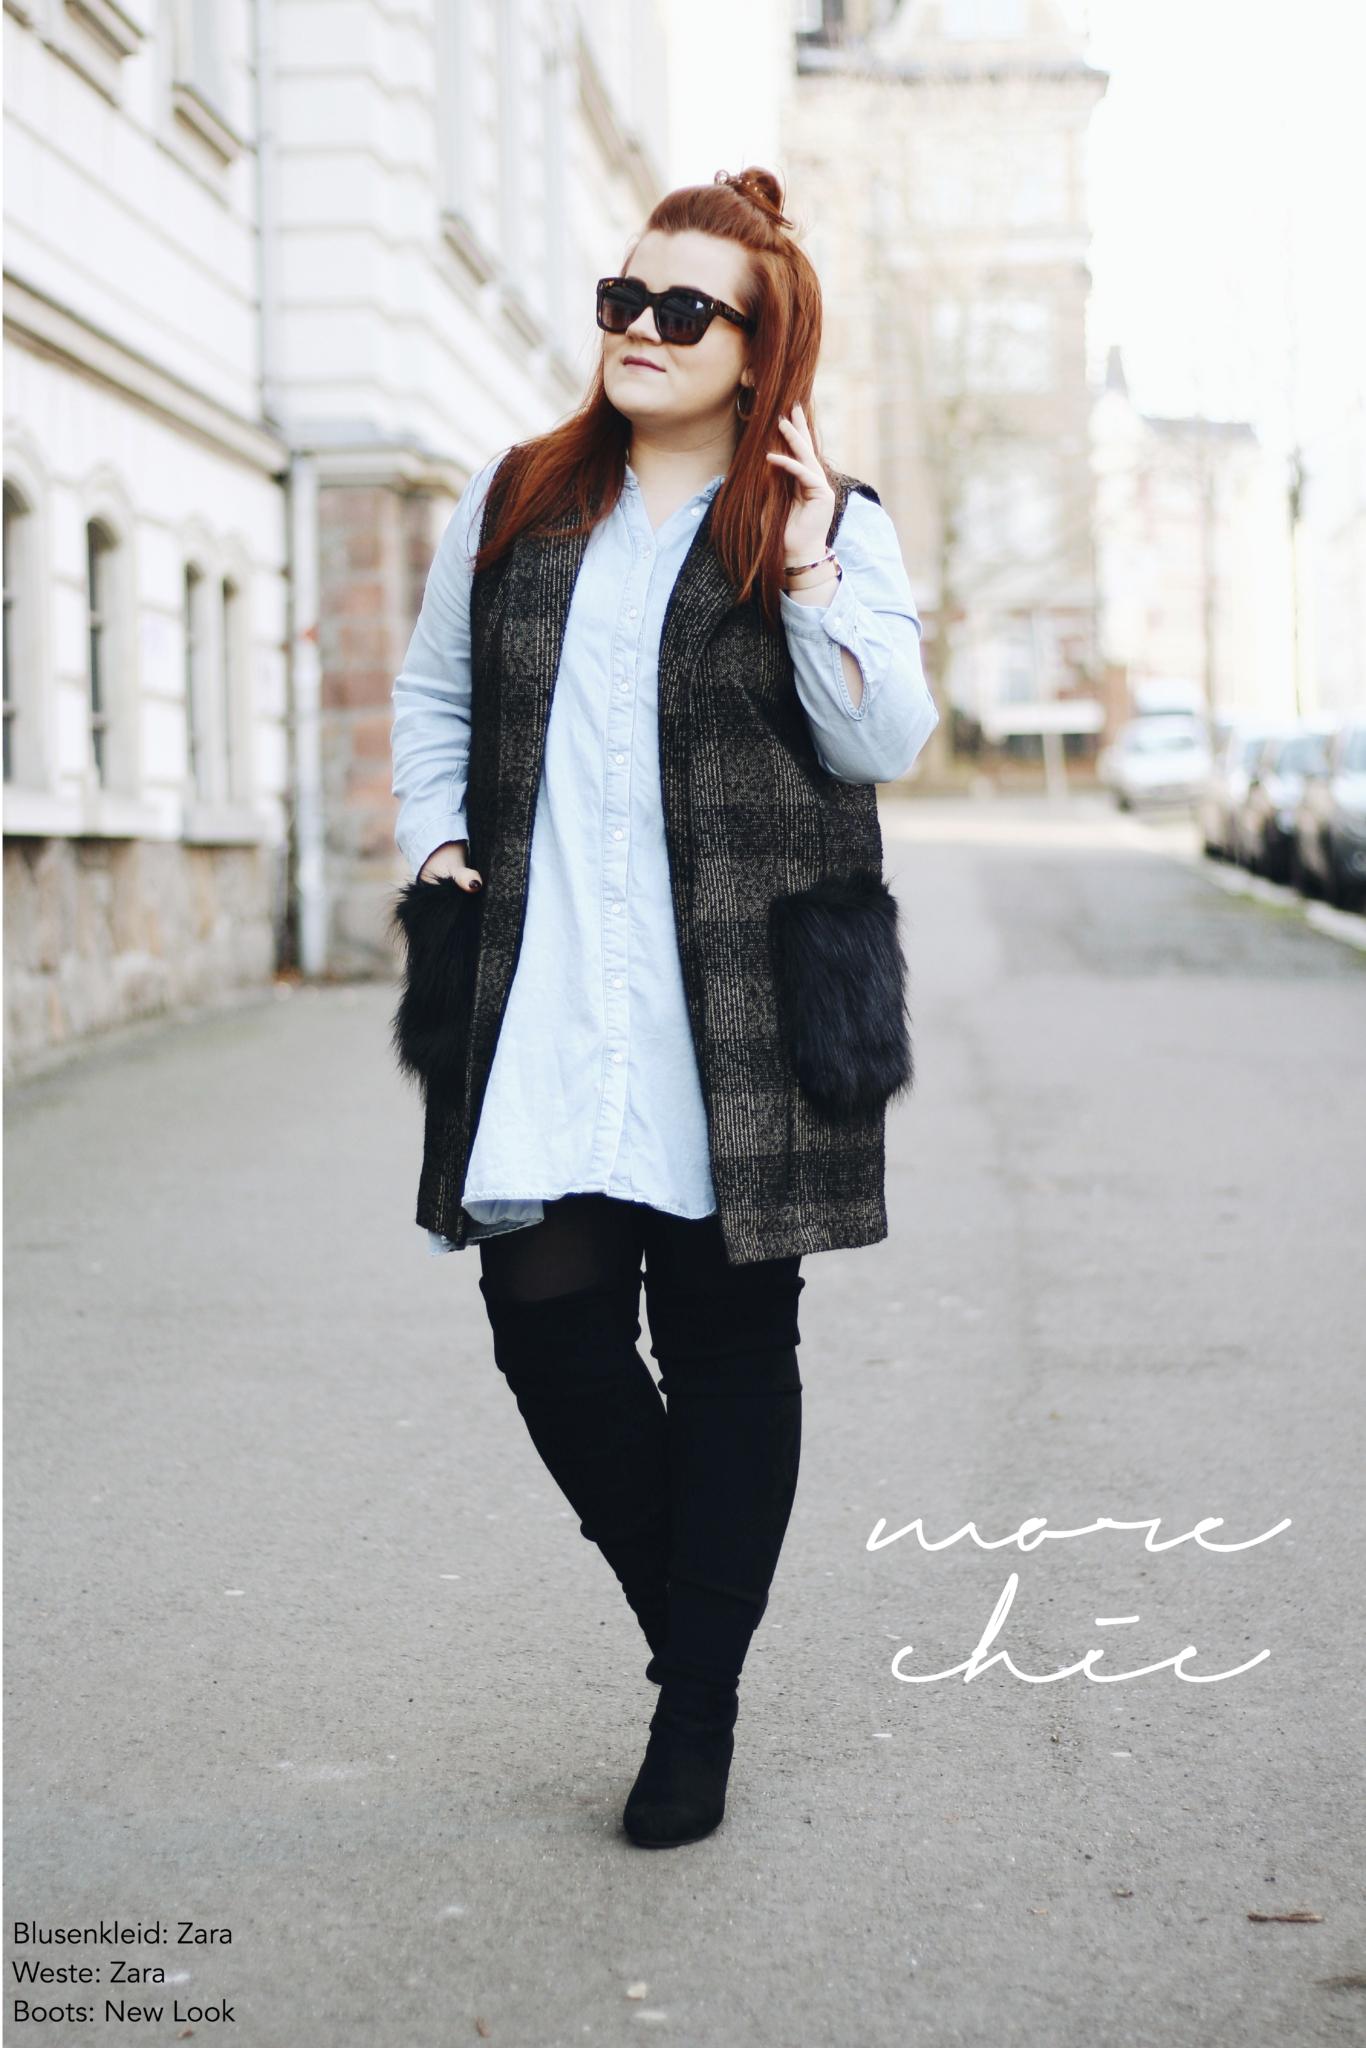 Details vom Outfit: Outfit Inspiration: So trage ich lange Westen mit Fake Fur - Kunstfell - Fashion Blog aus Leipzig